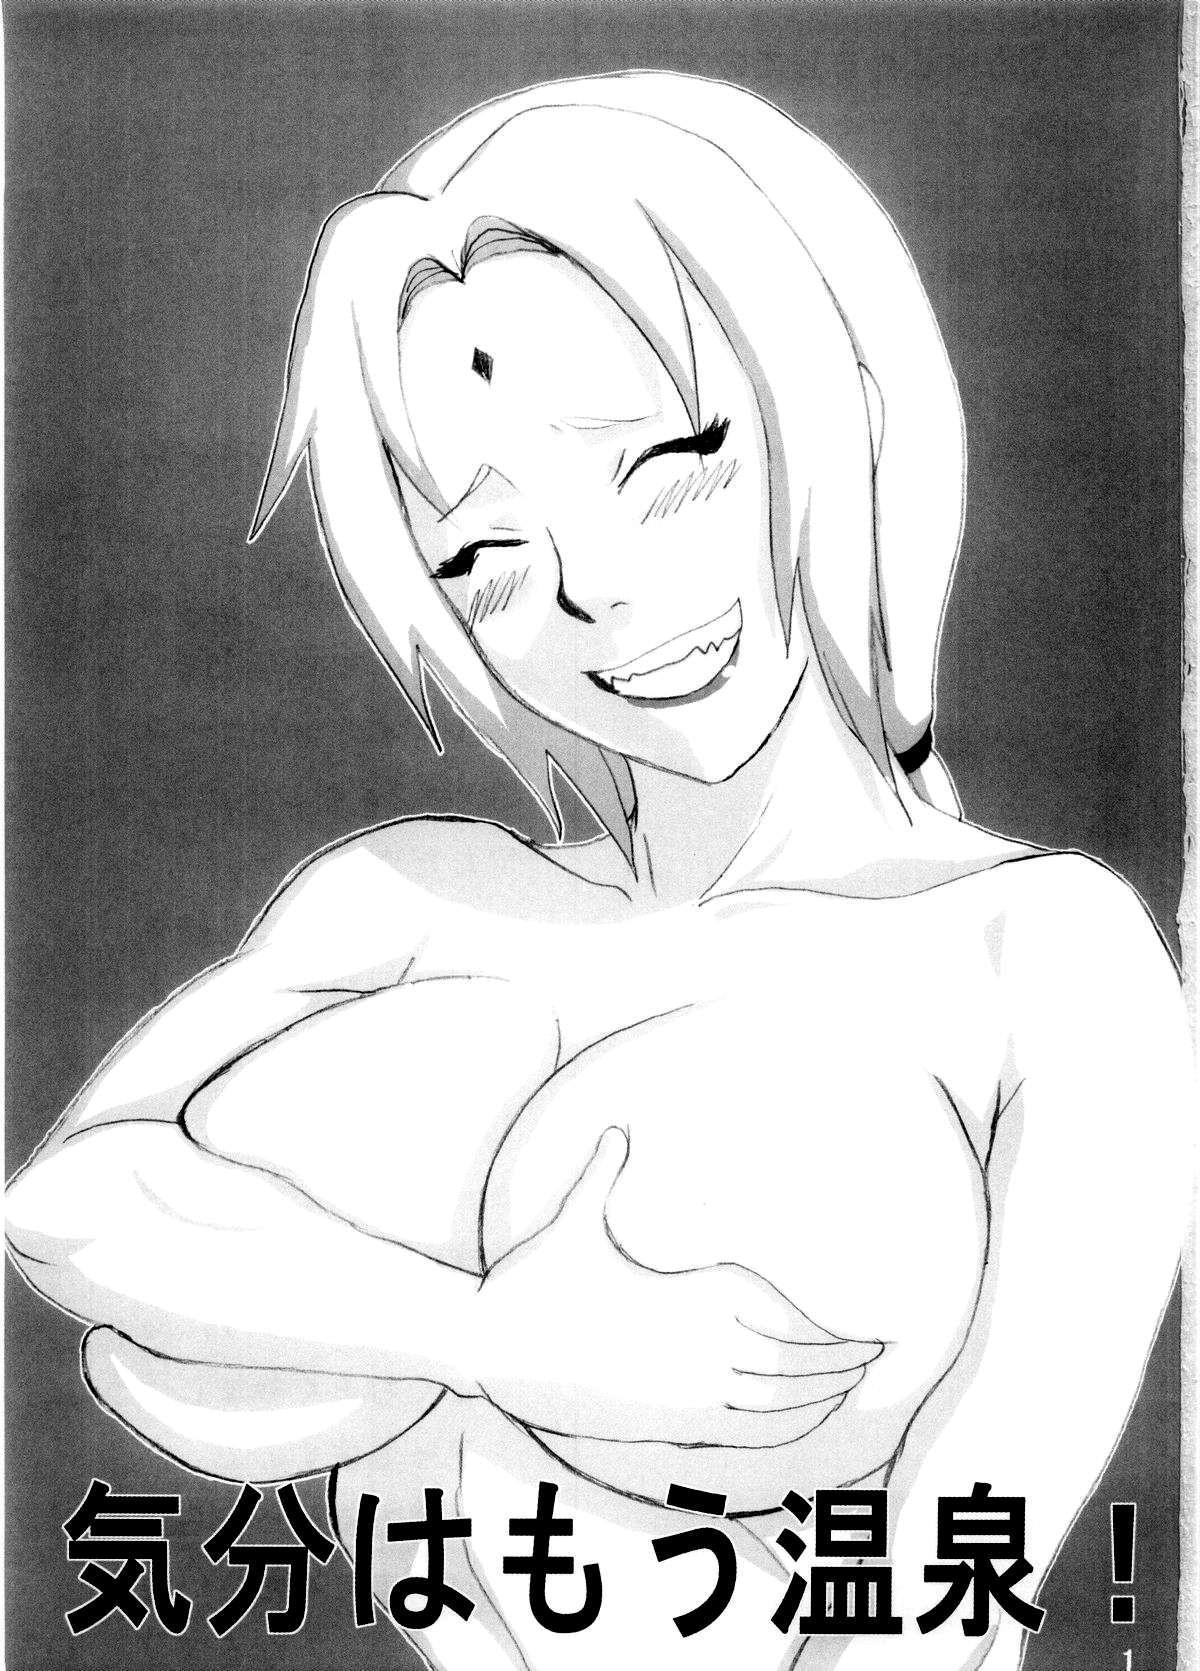 Kibun wa mou Onsen   Feels like Hot Springs 1